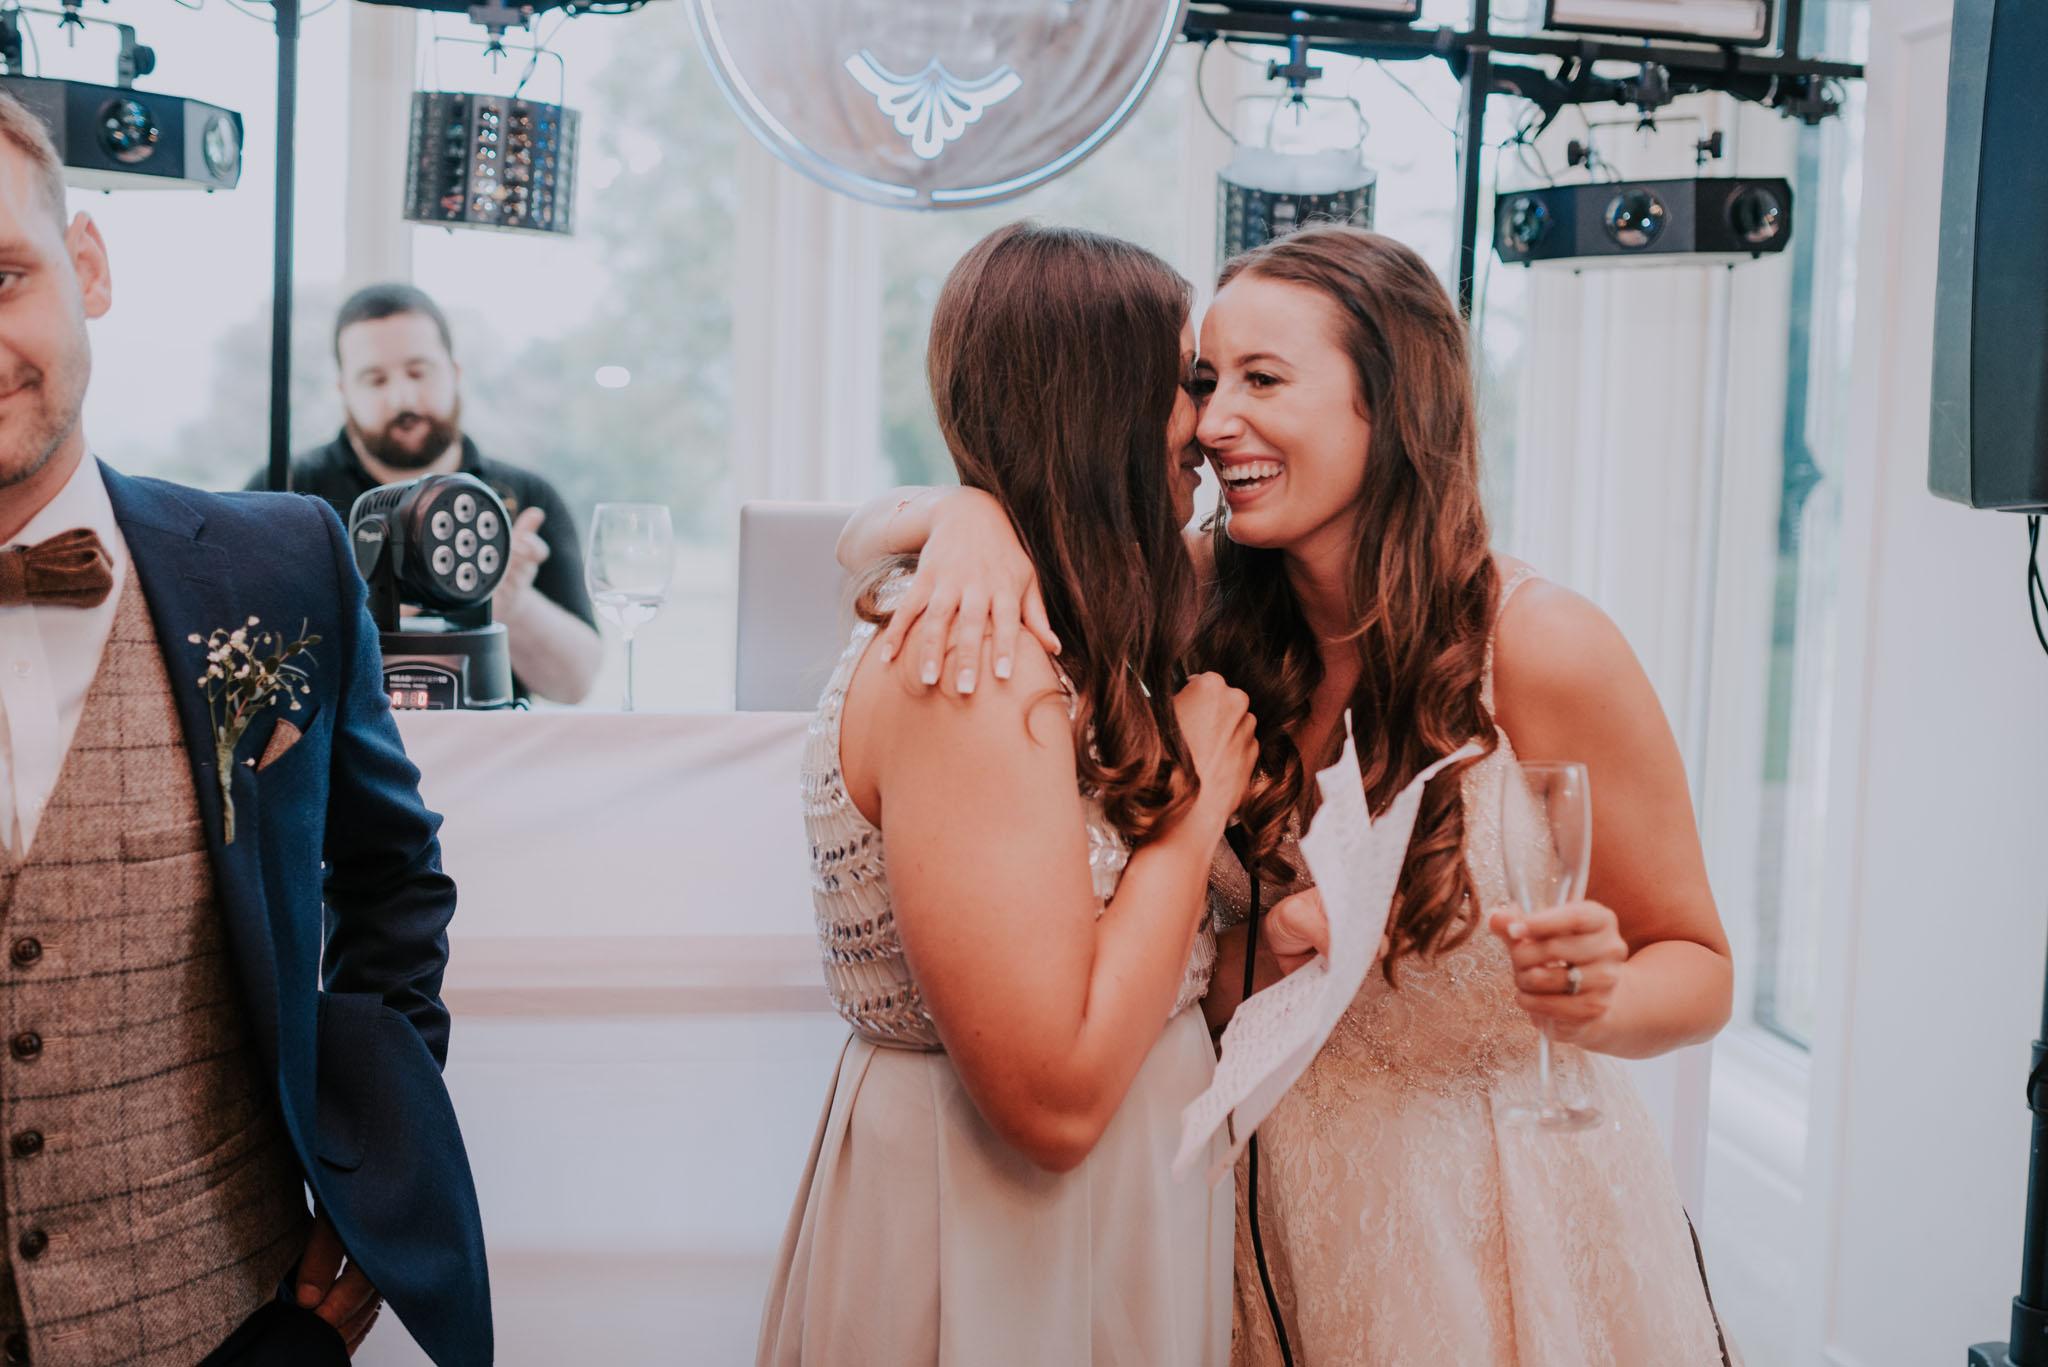 wedding-photographer-glewstone-court-hereford-scott-stockwell-photography438.jpg